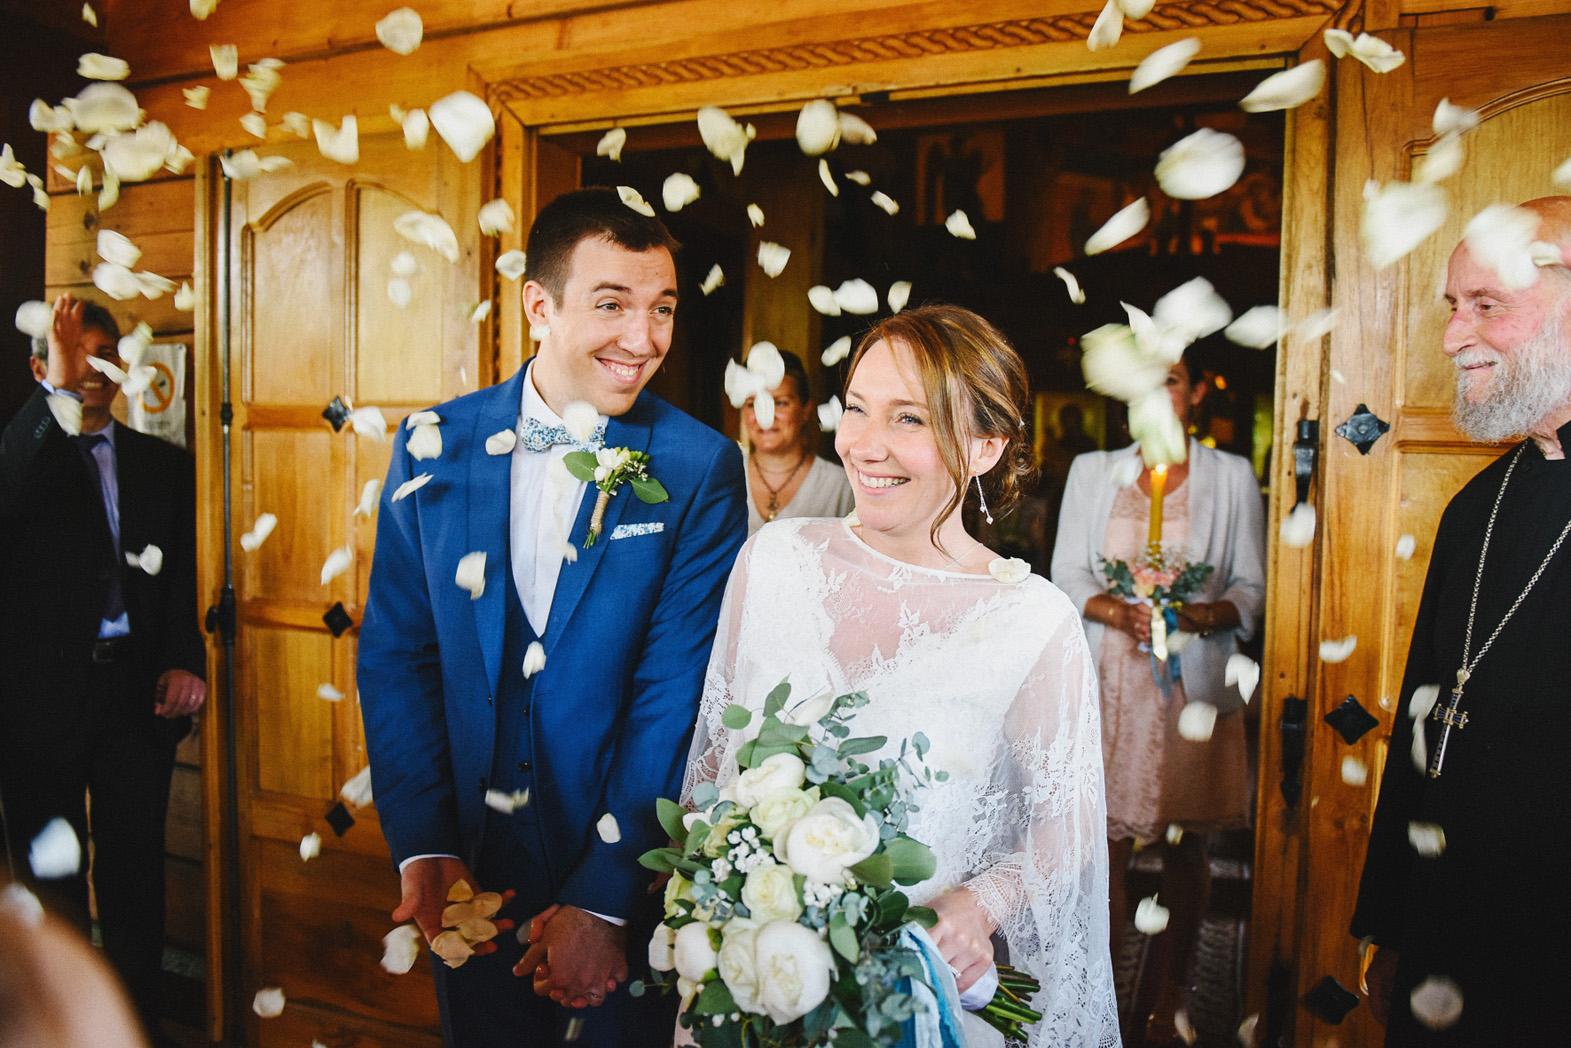 sortie cérémonie mariage orthodoxe